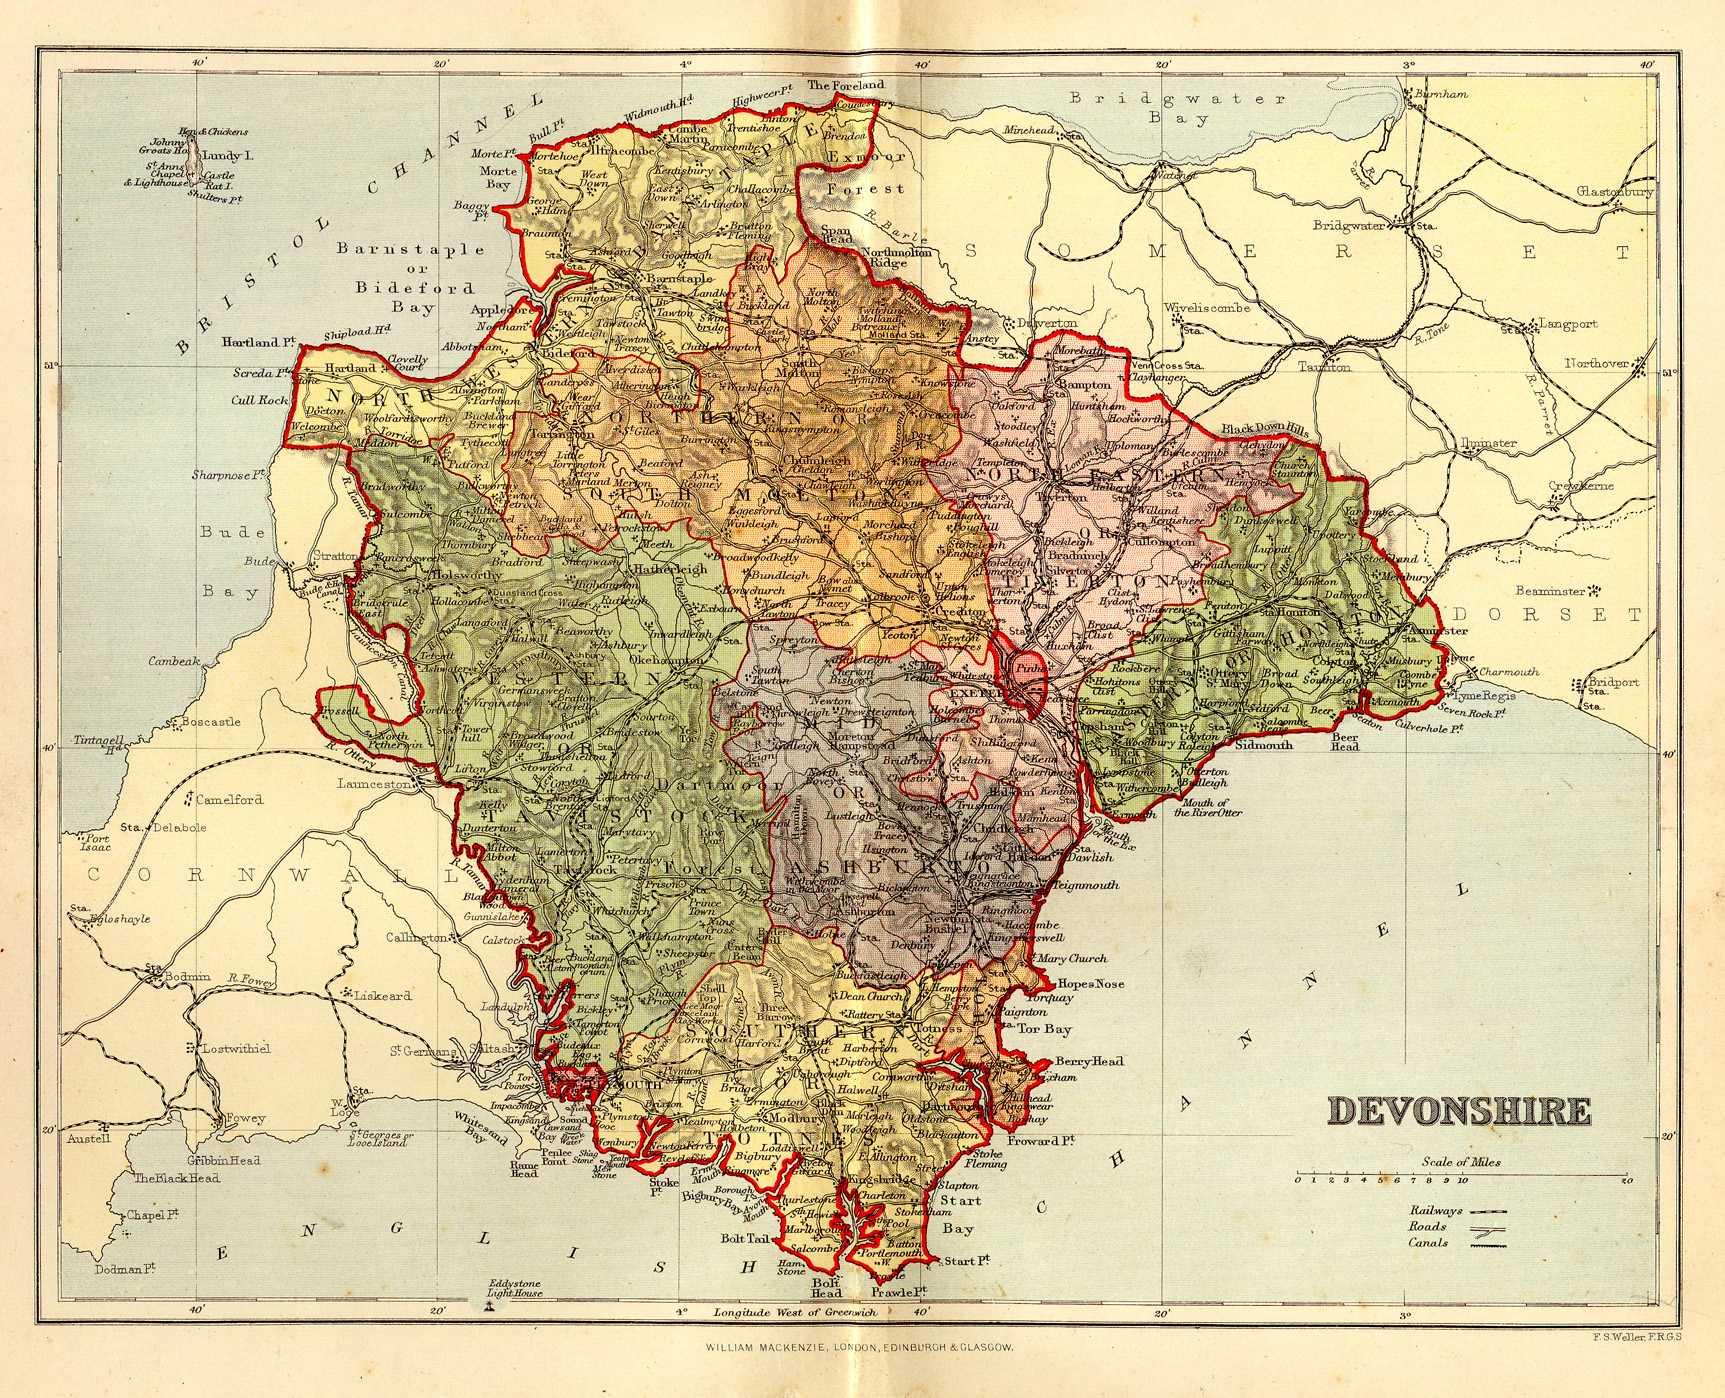 Devon genealogy heraldry and family history